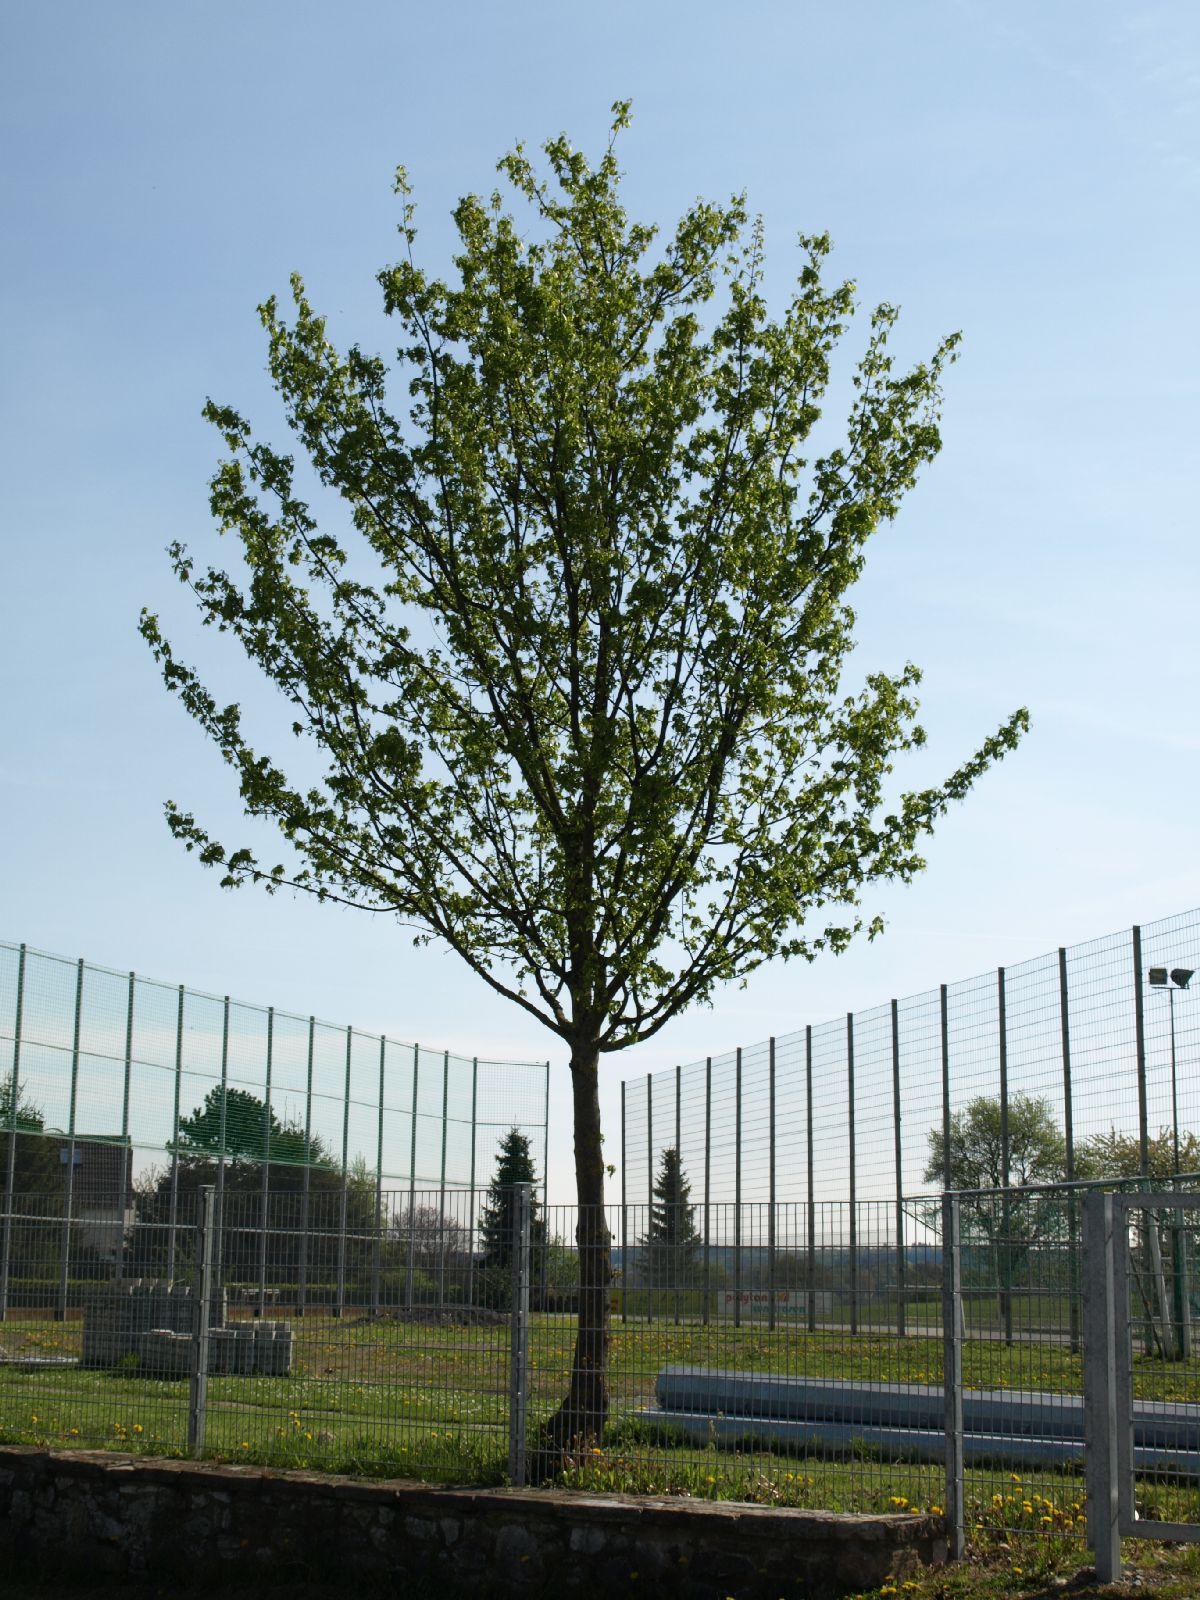 Pflanzen-Baum-Foto_Textur_B_P5032300